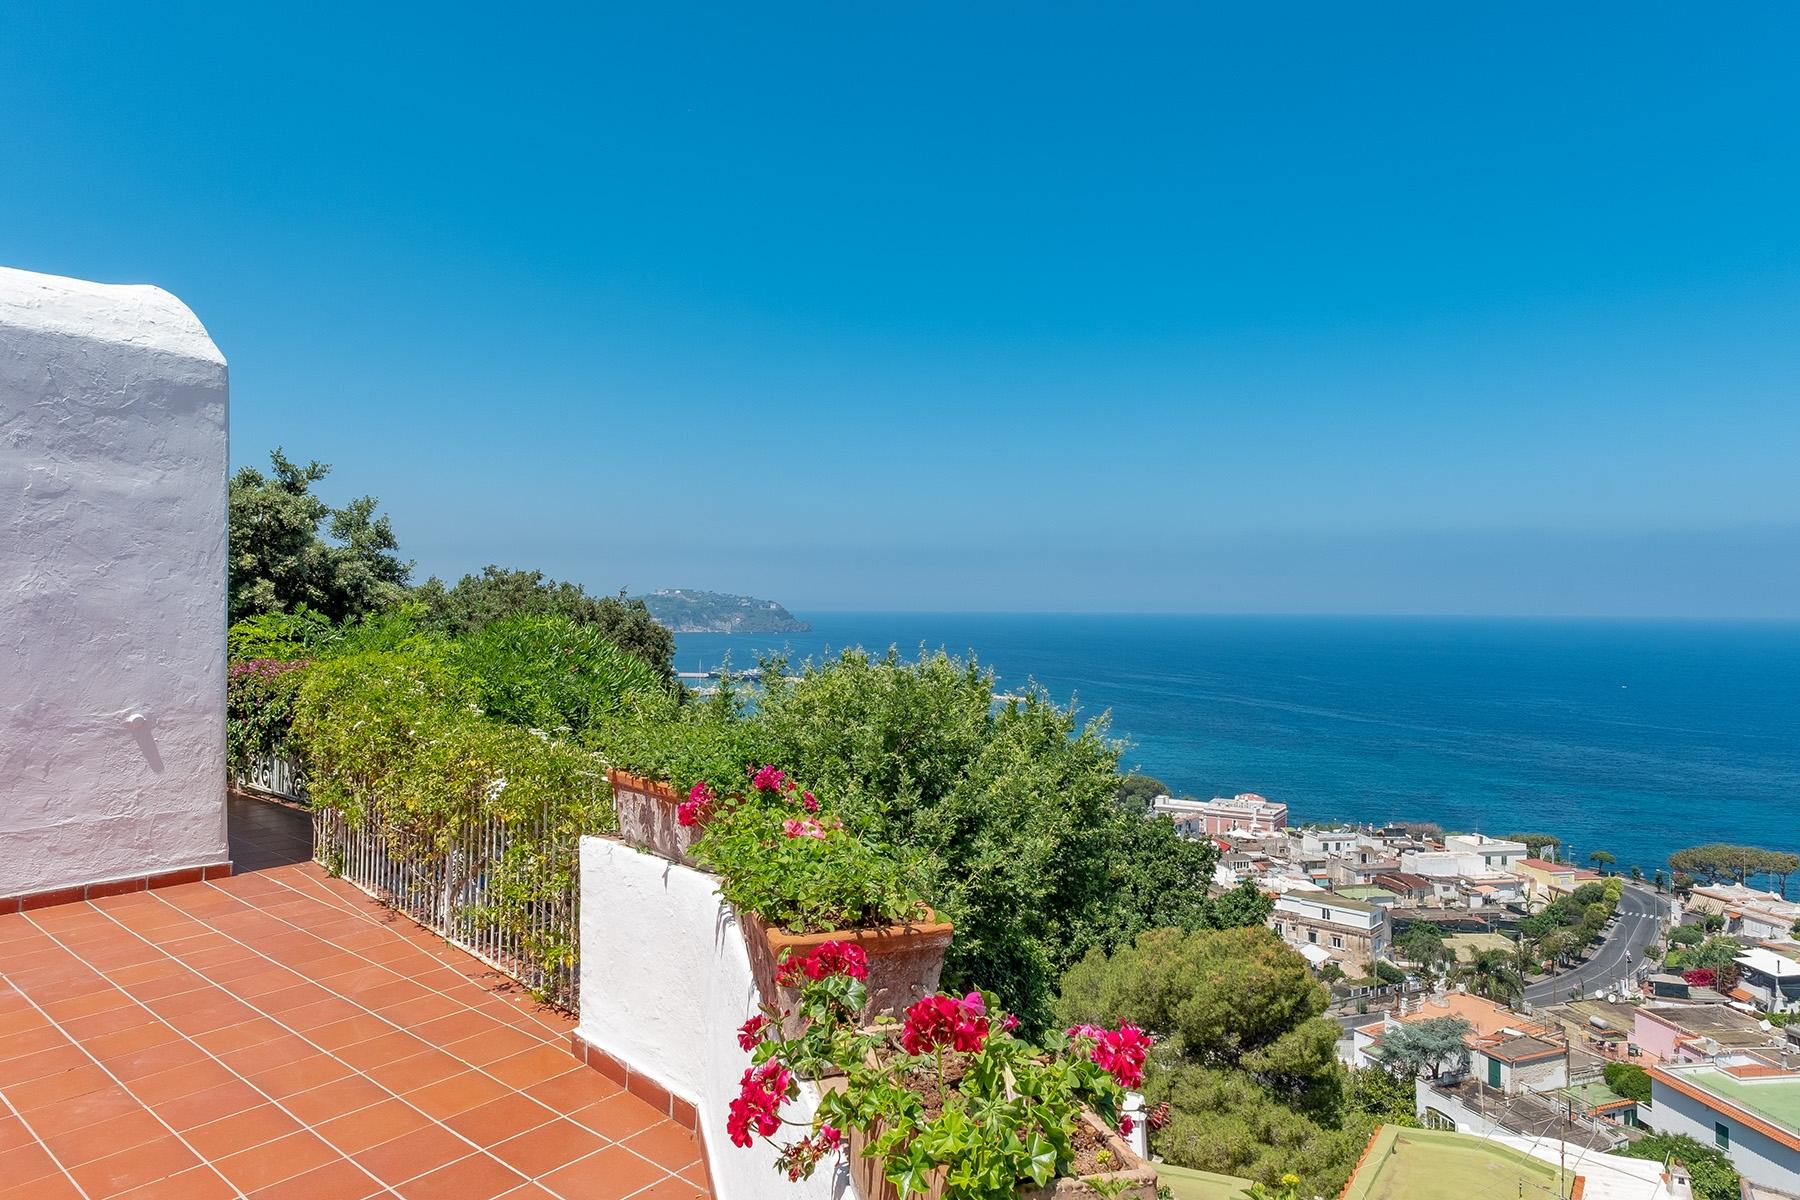 Villa in Vendita a Ischia: 5 locali, 206 mq - Foto 19